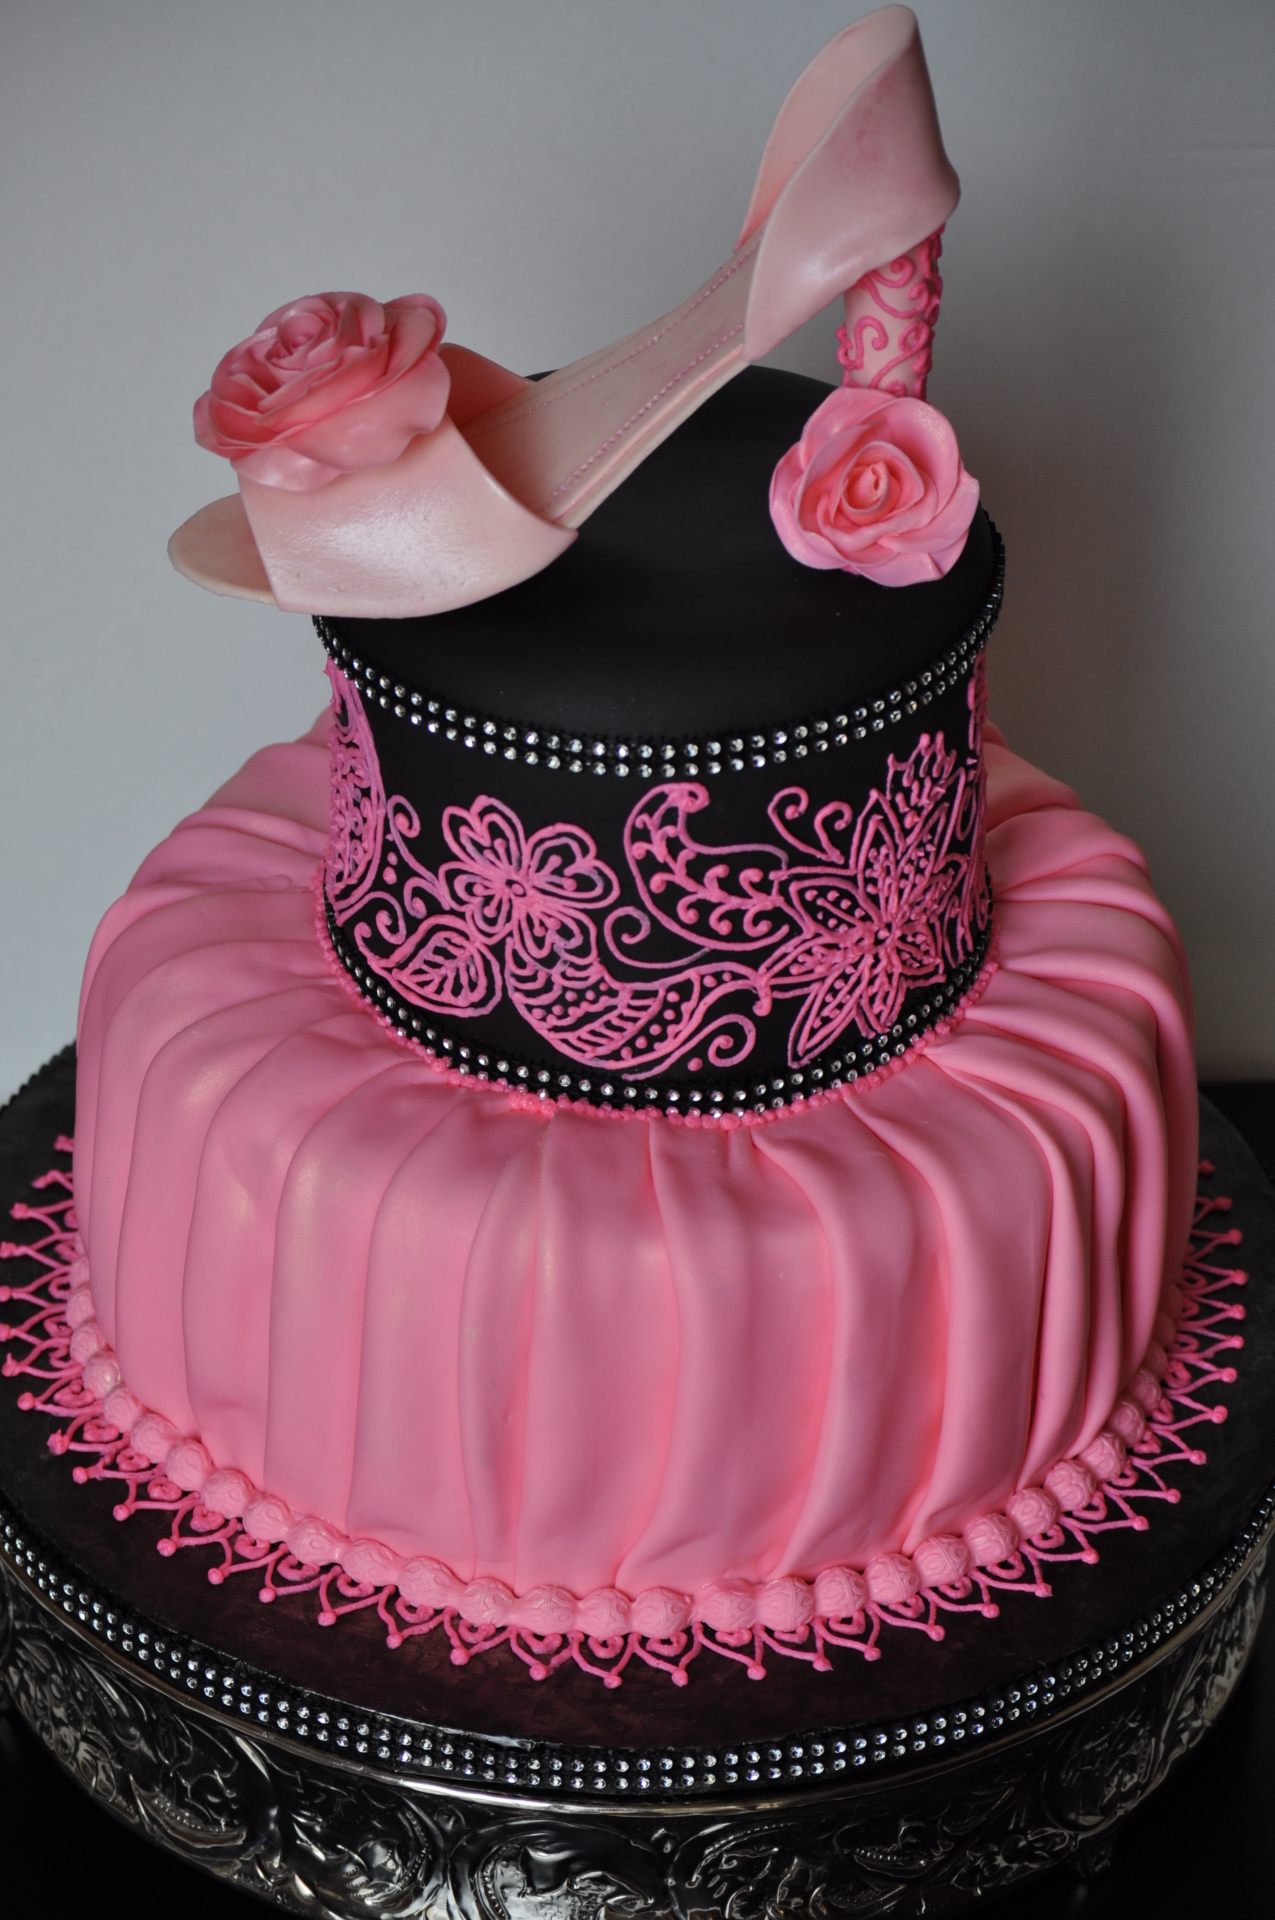 Heels and henna cake-4, pleated draped cake